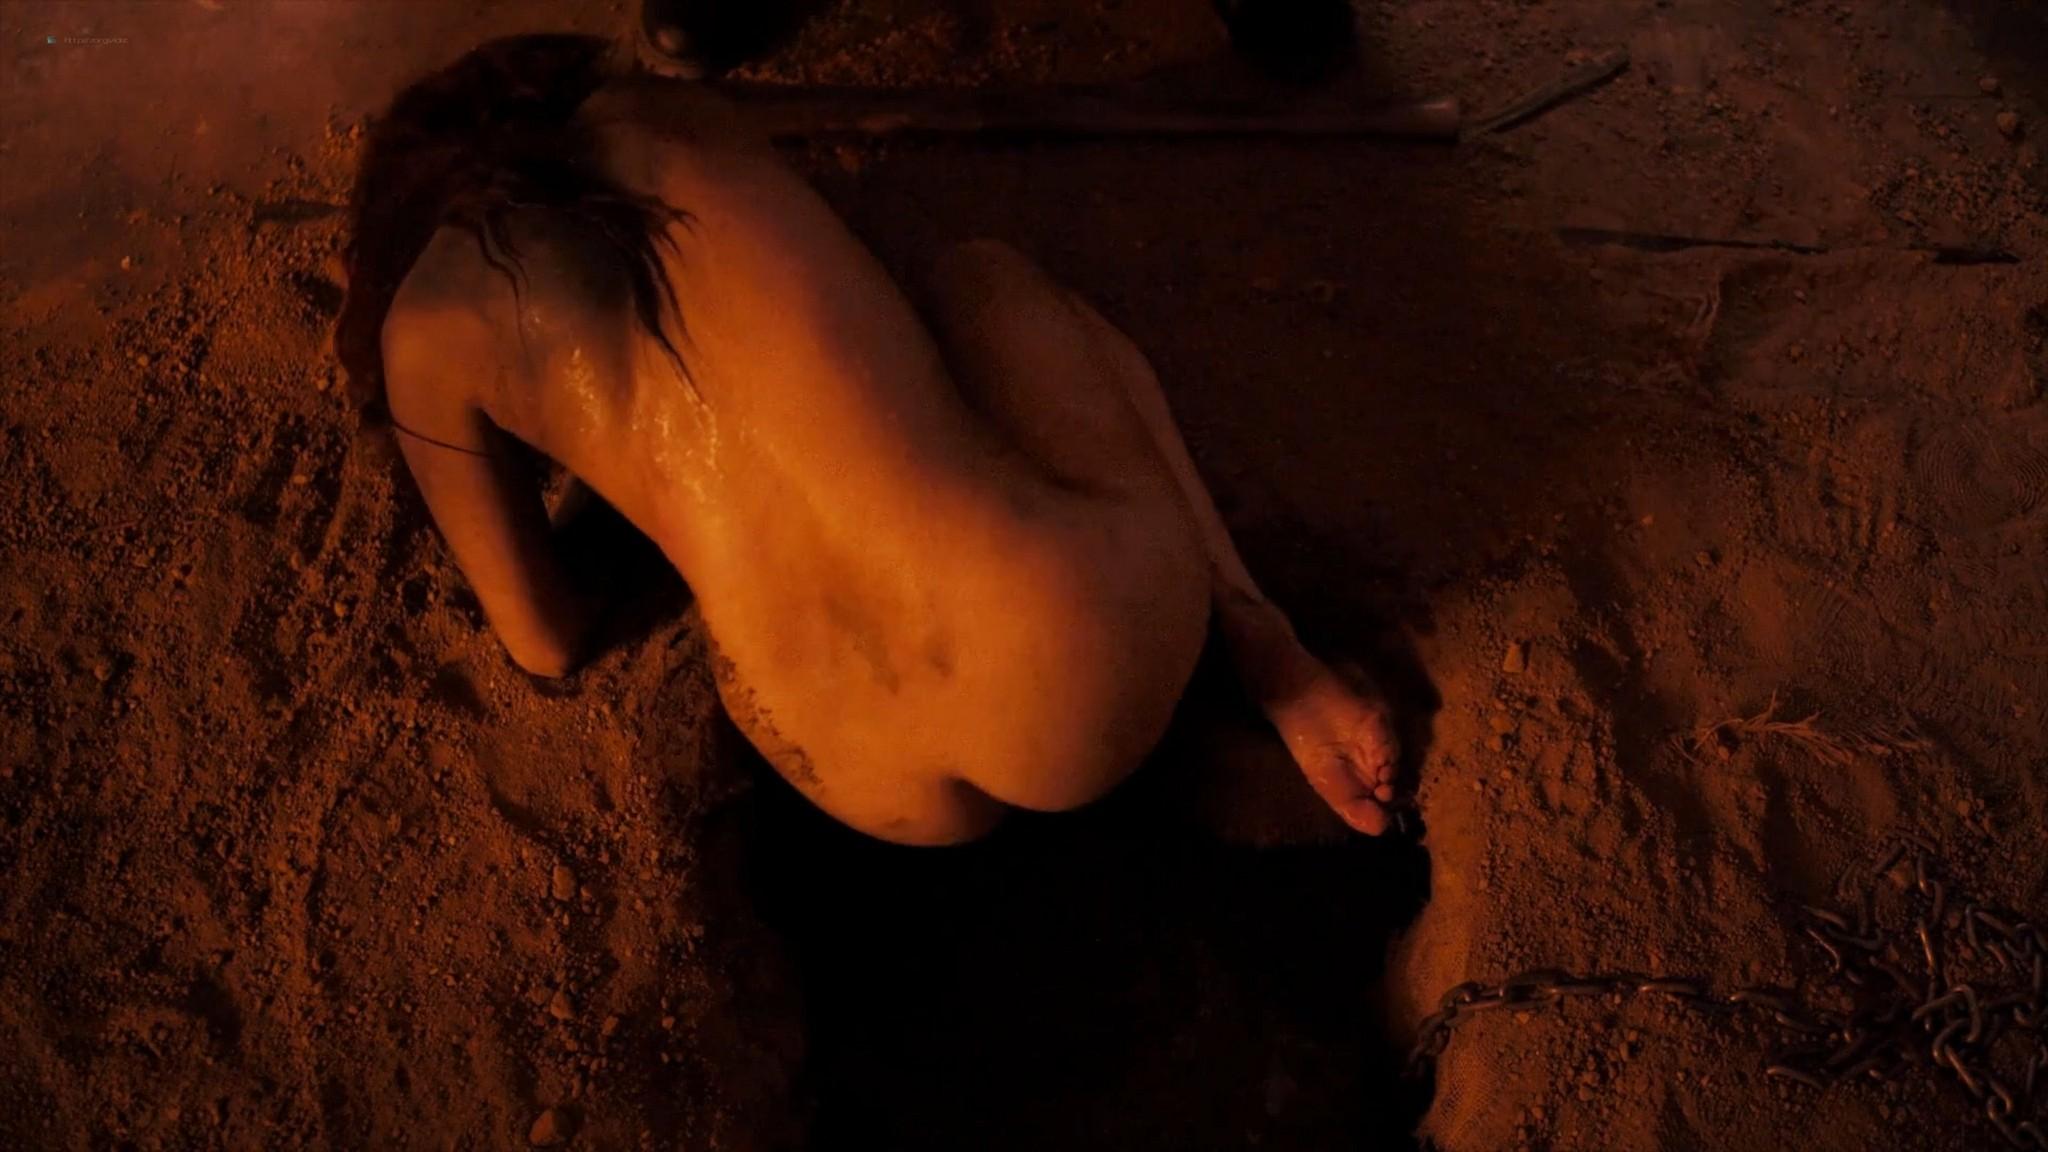 Sadie Katz nude lesbian sex with Victoria De Mare - Hanukkah (2019) HD 1080p Web (8)